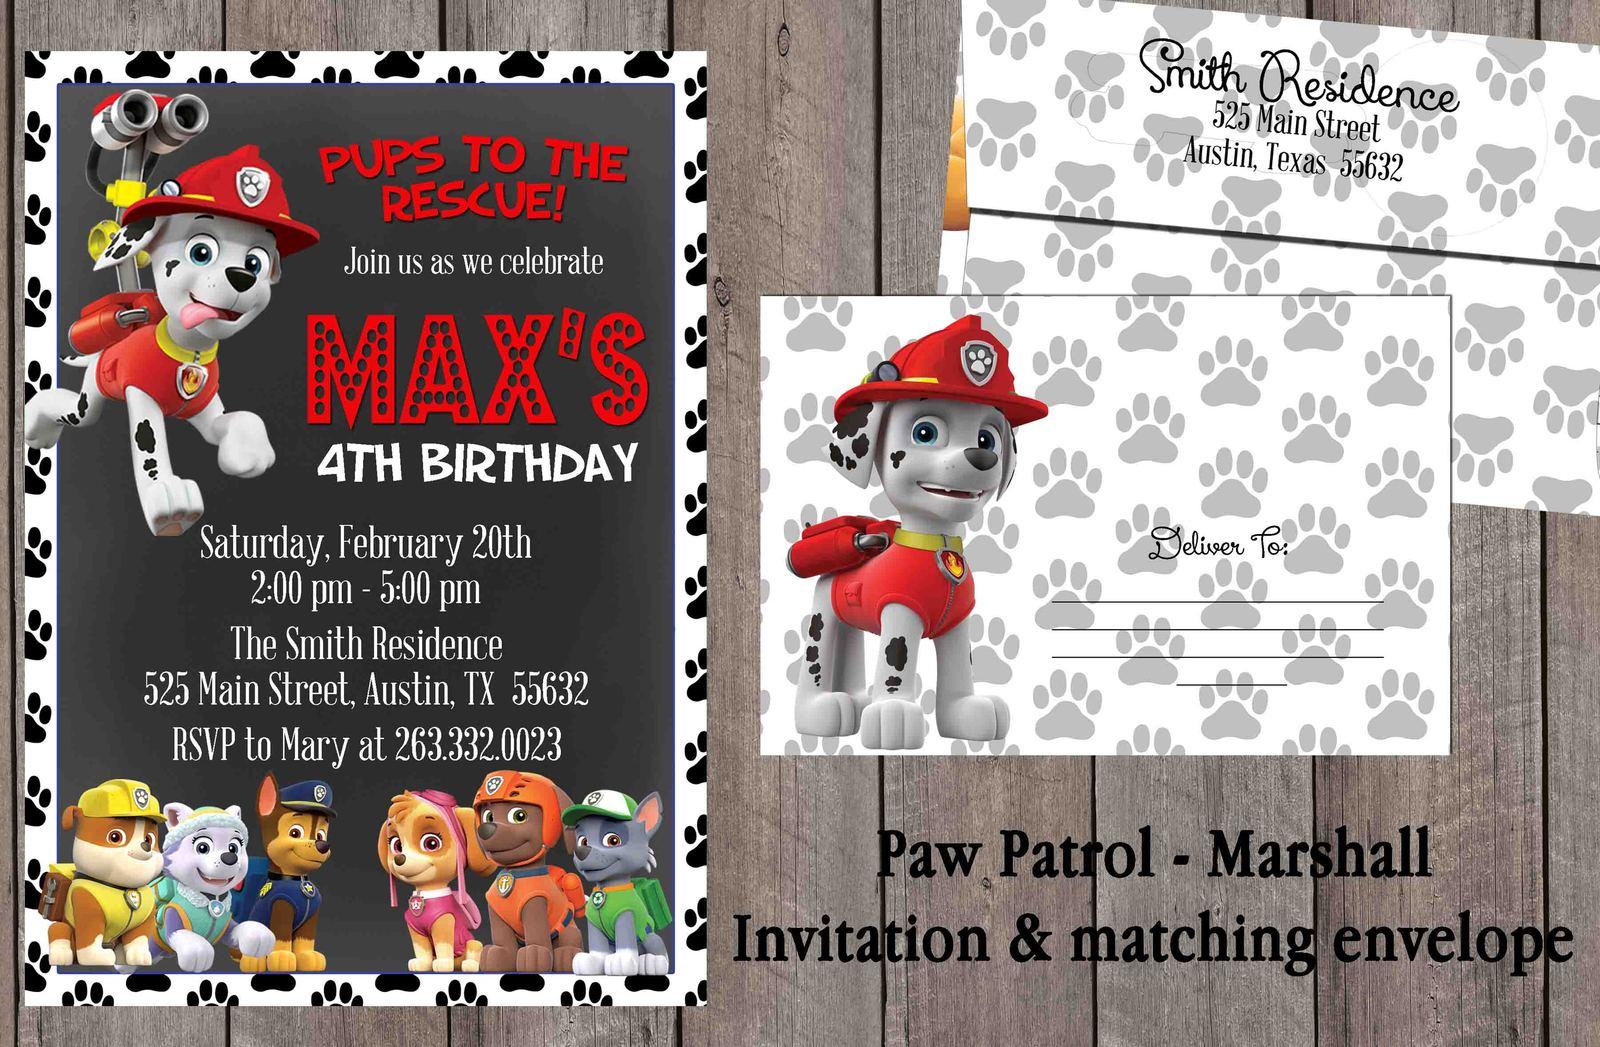 Paw Patrol Marshall Birthday Invitation Set And Similar Items